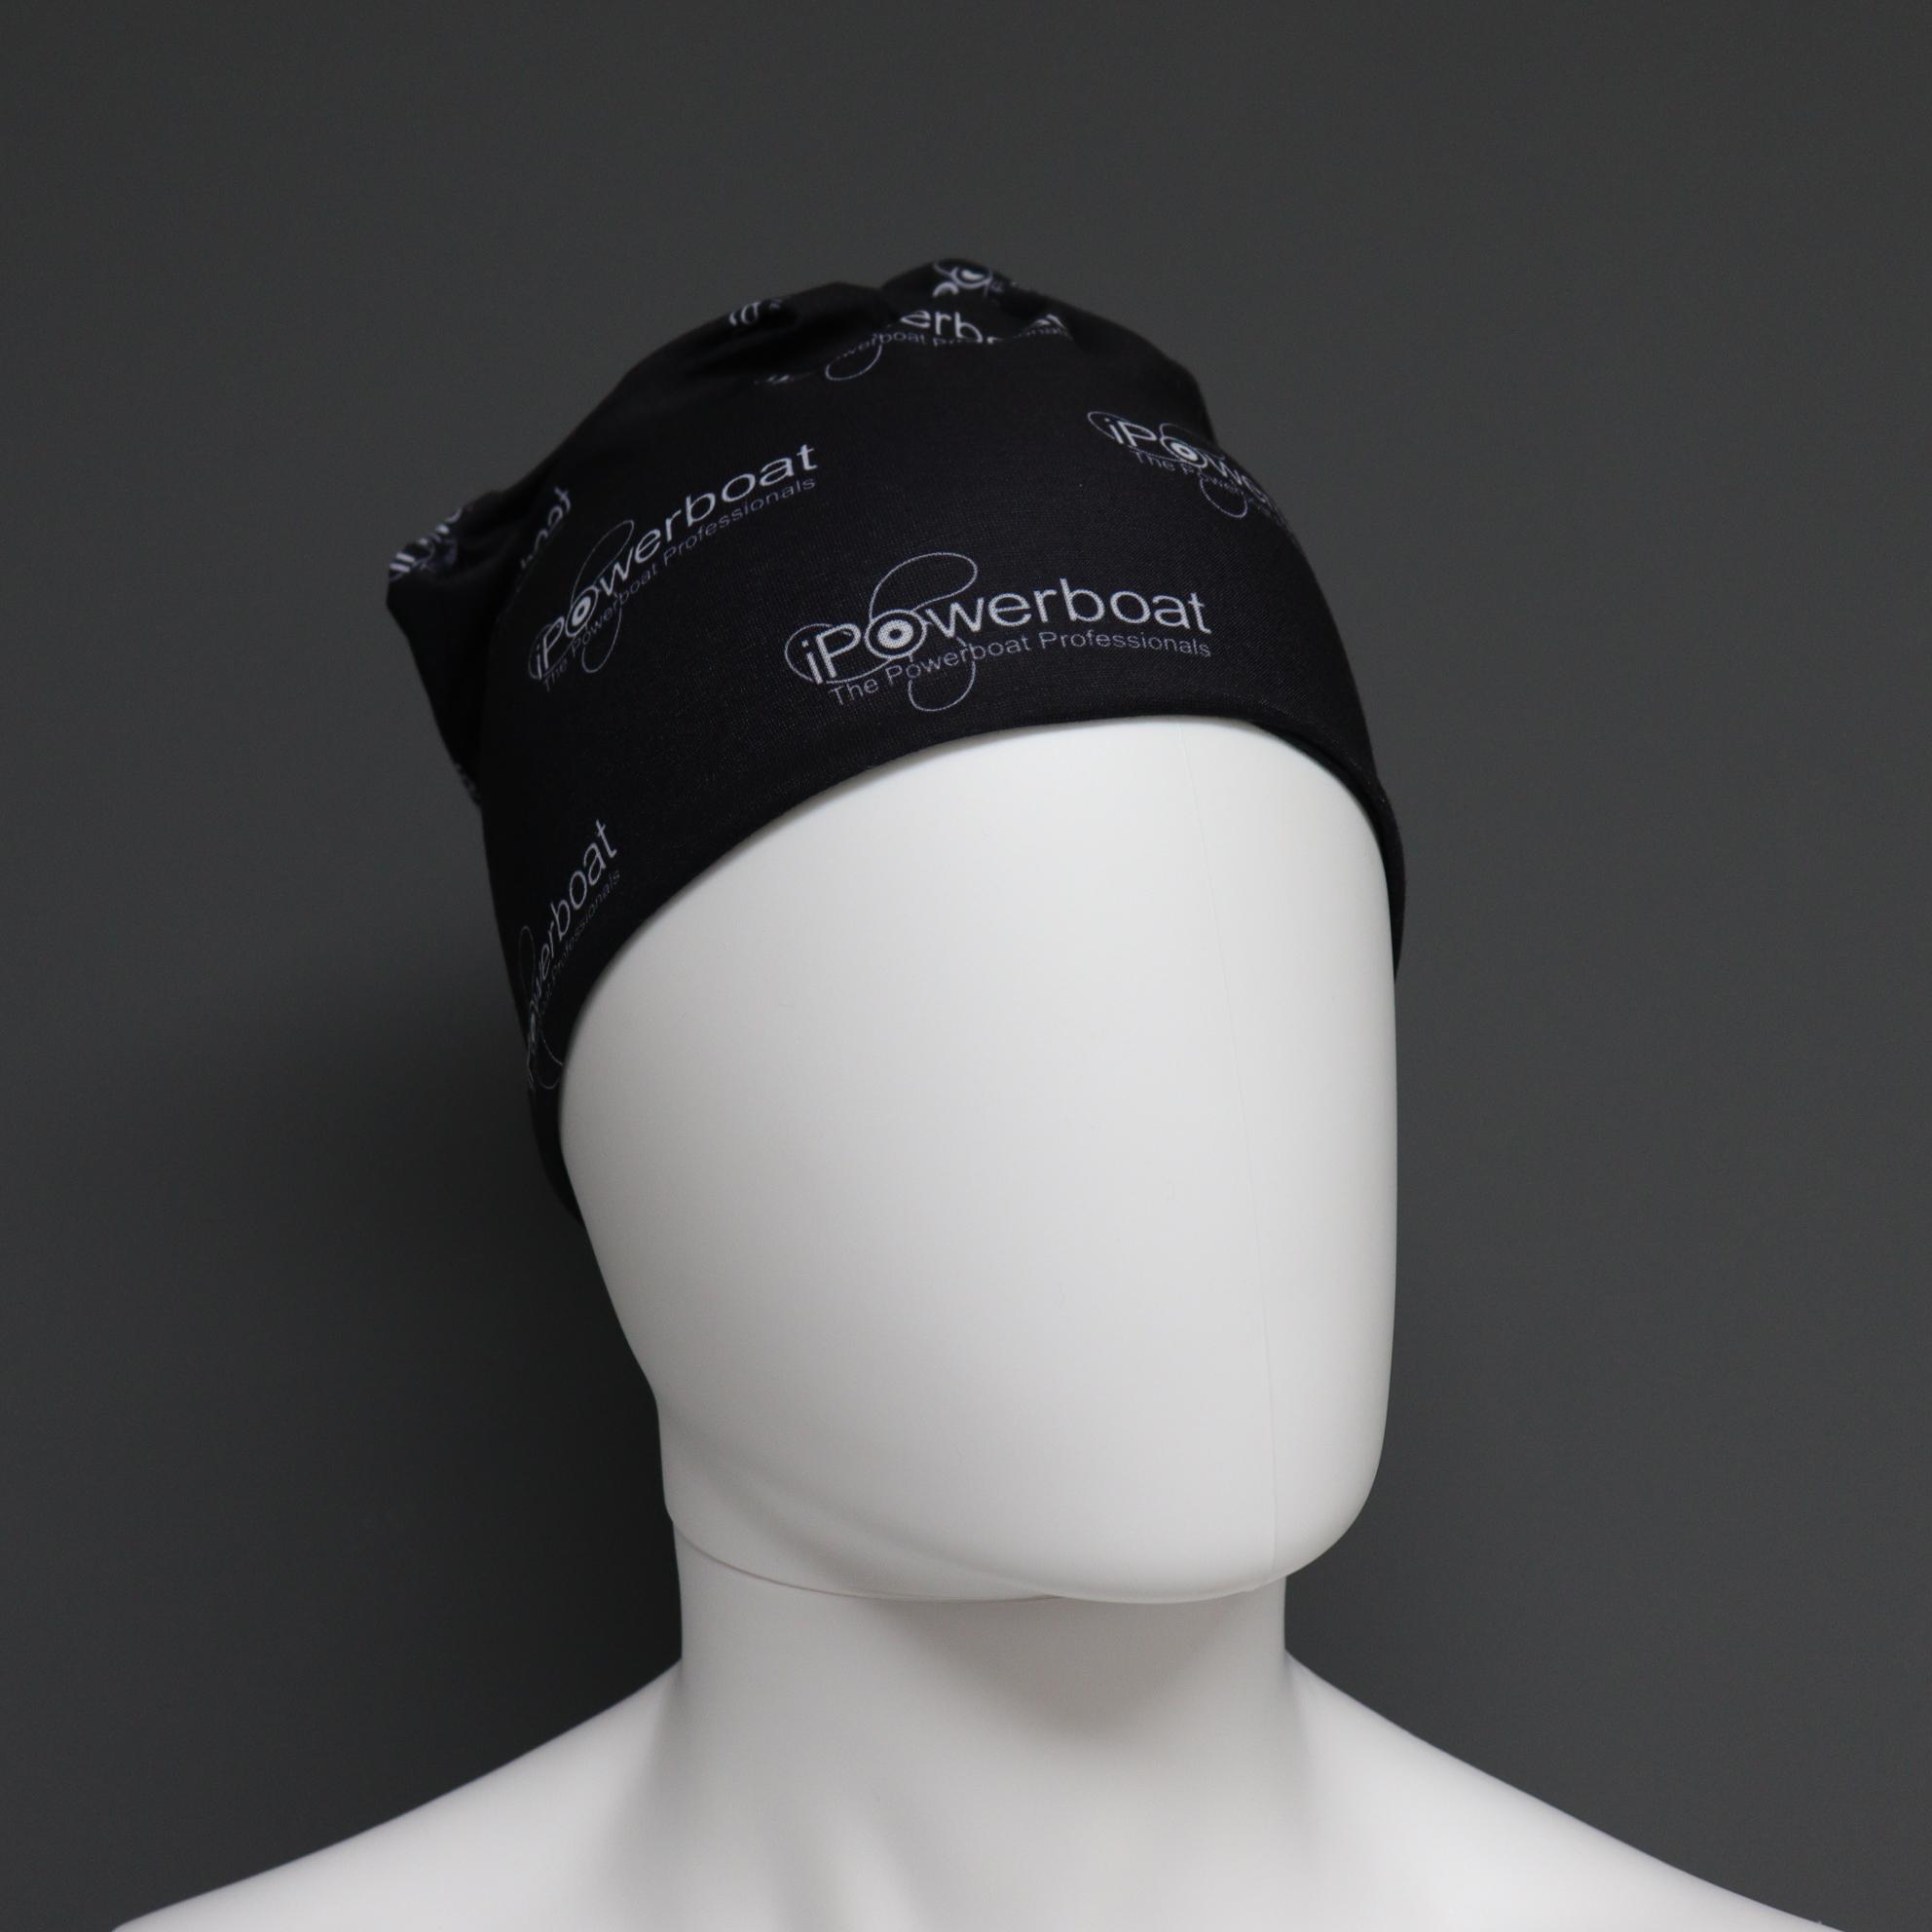 Custom Printed Buff Style Headwear - Powerboat